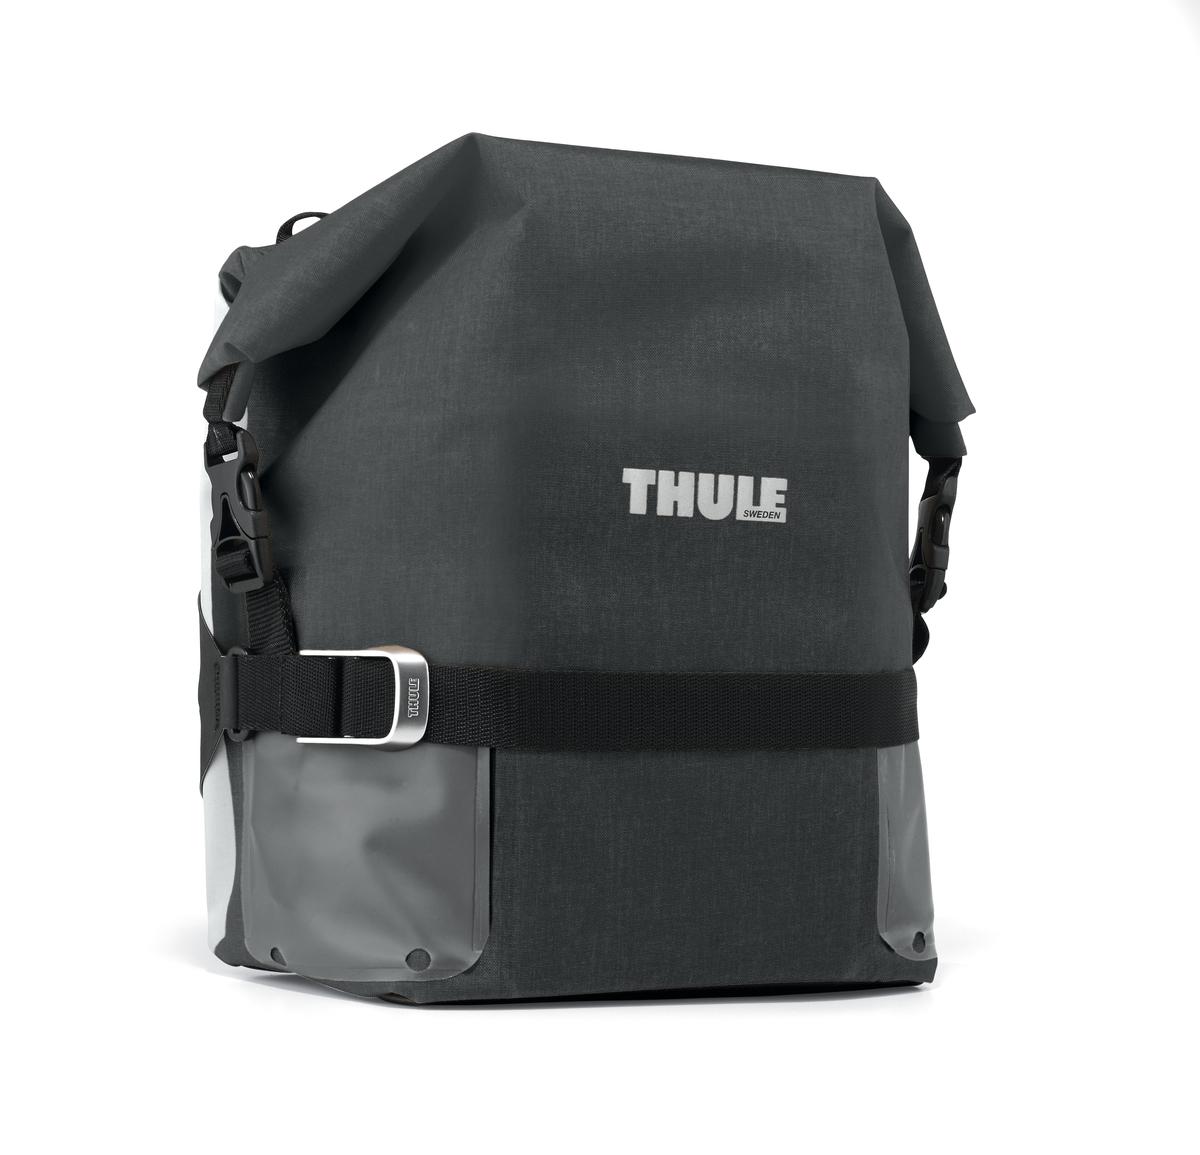 Сумка велосипедная Thule Small Adventure Touring Pannier, цвет: черный